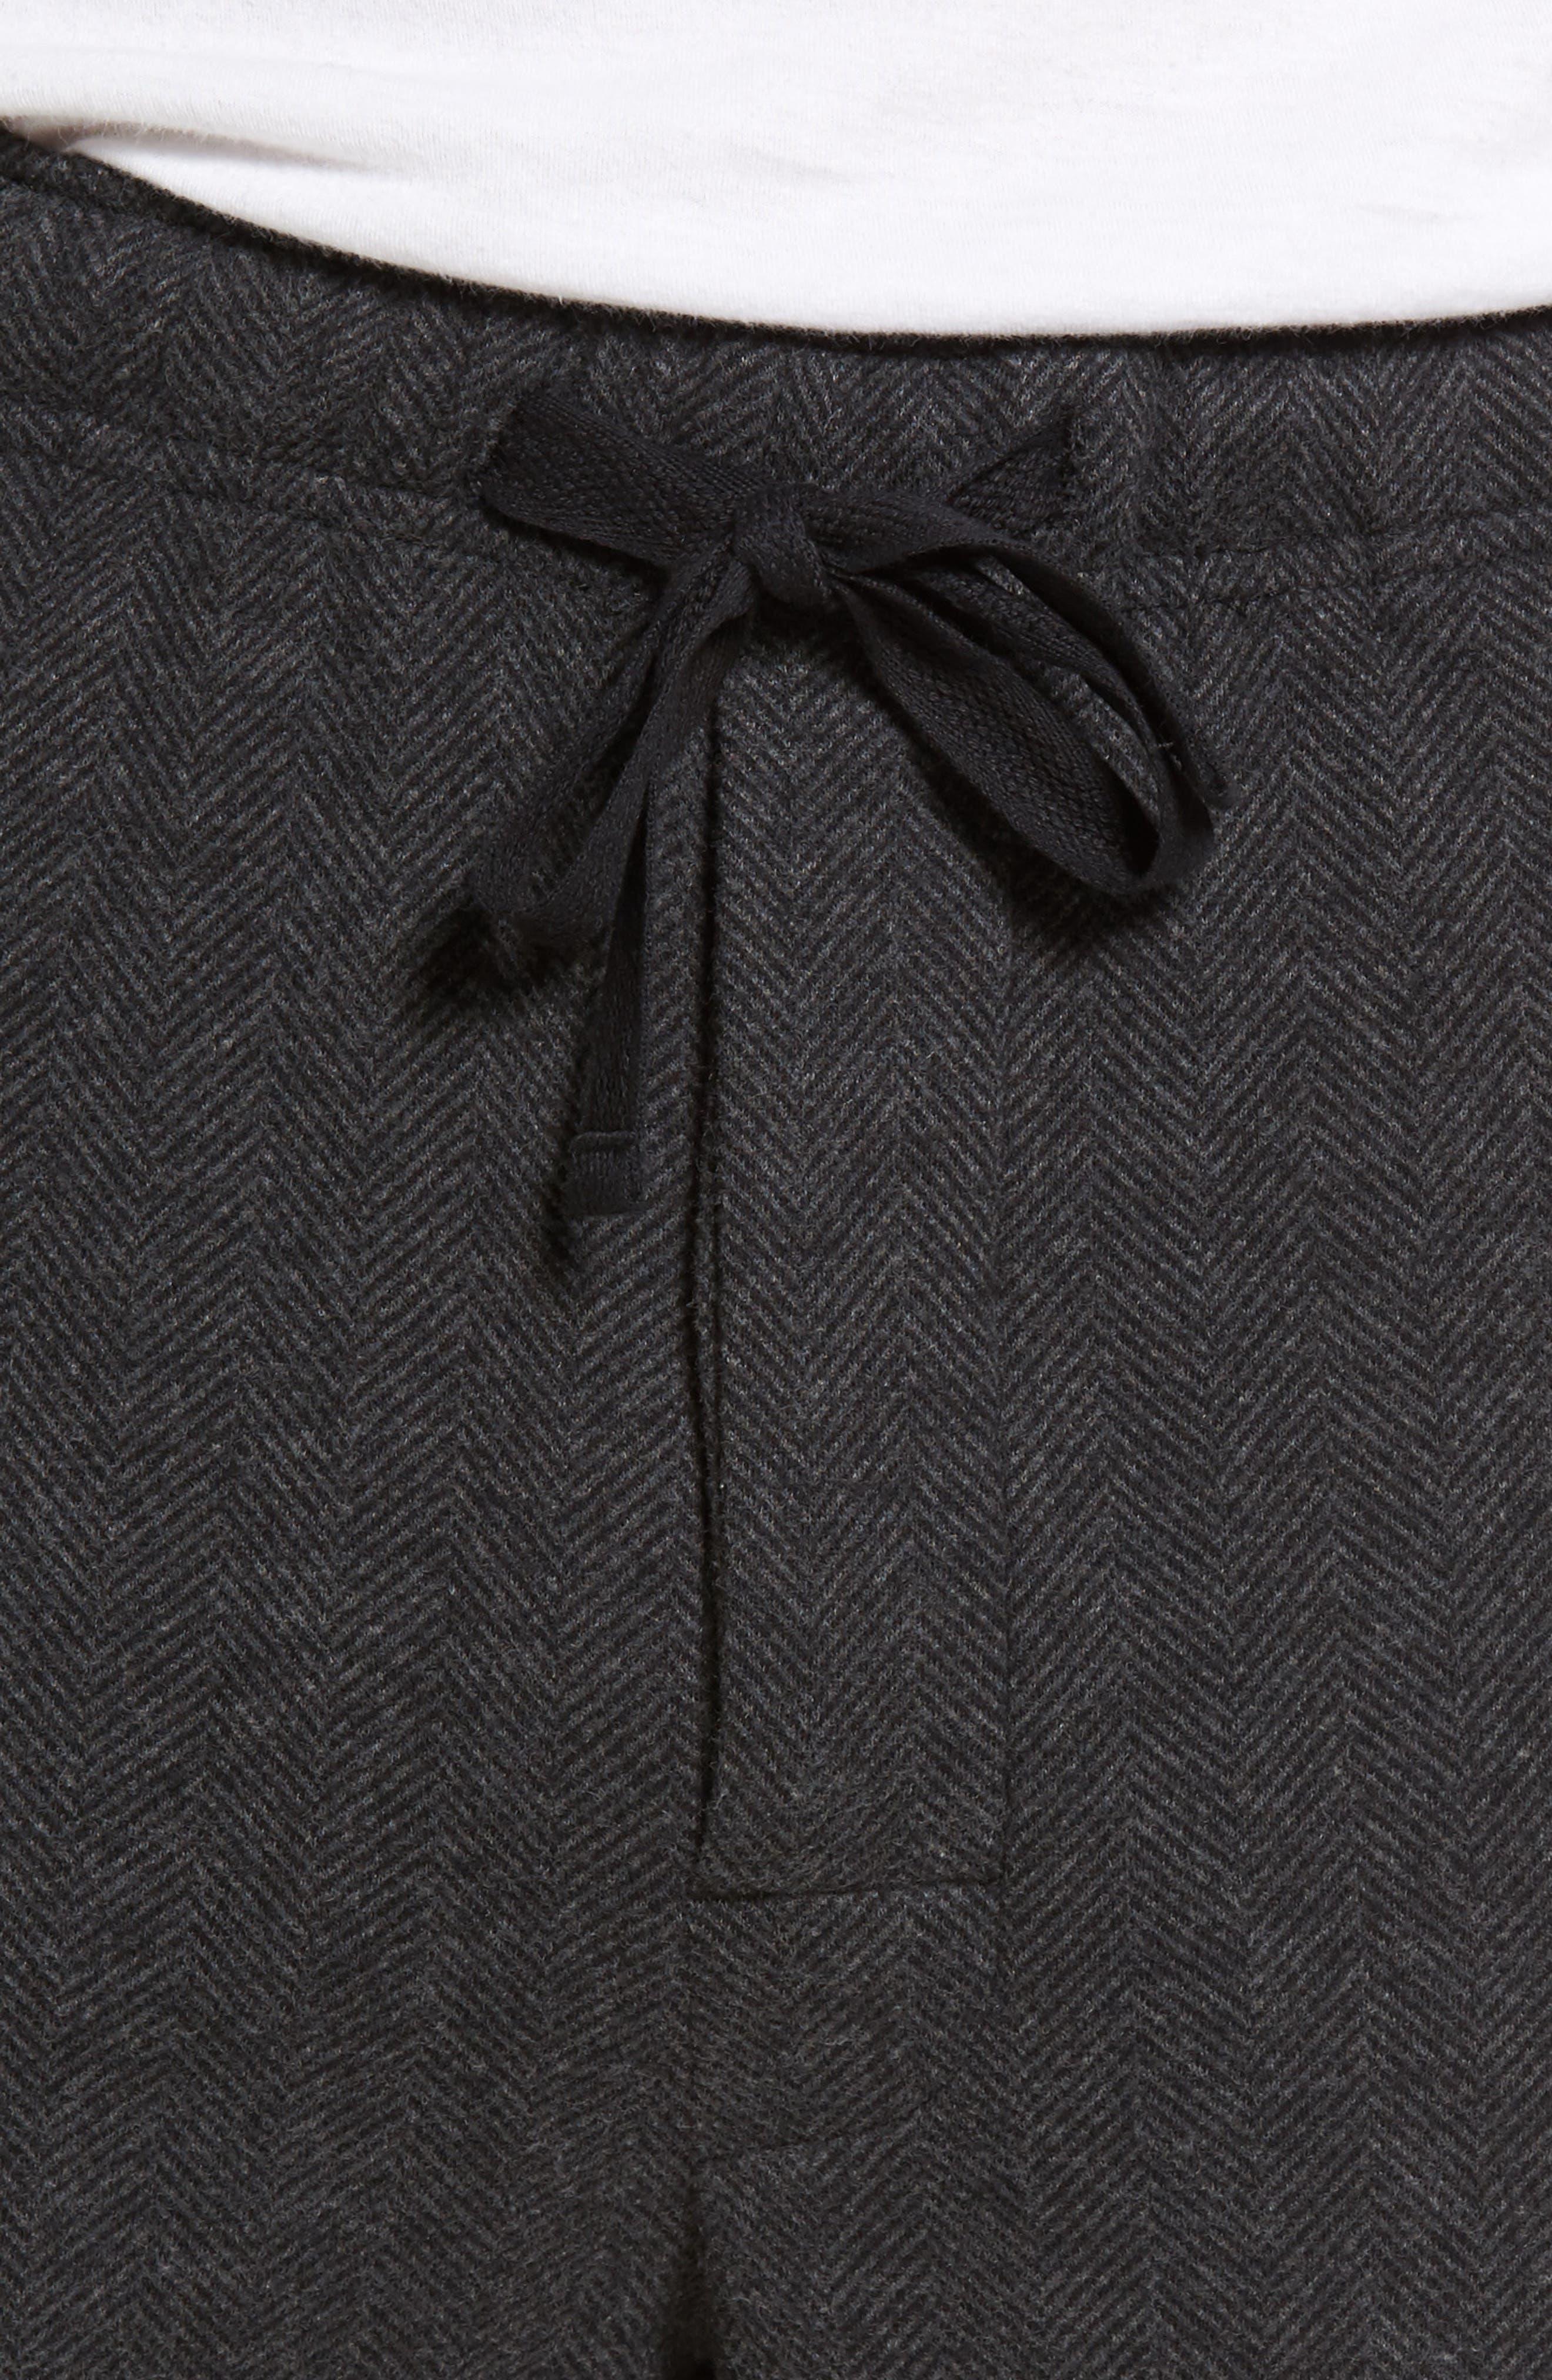 Grayson Lounge Pants,                             Alternate thumbnail 5, color,                             030